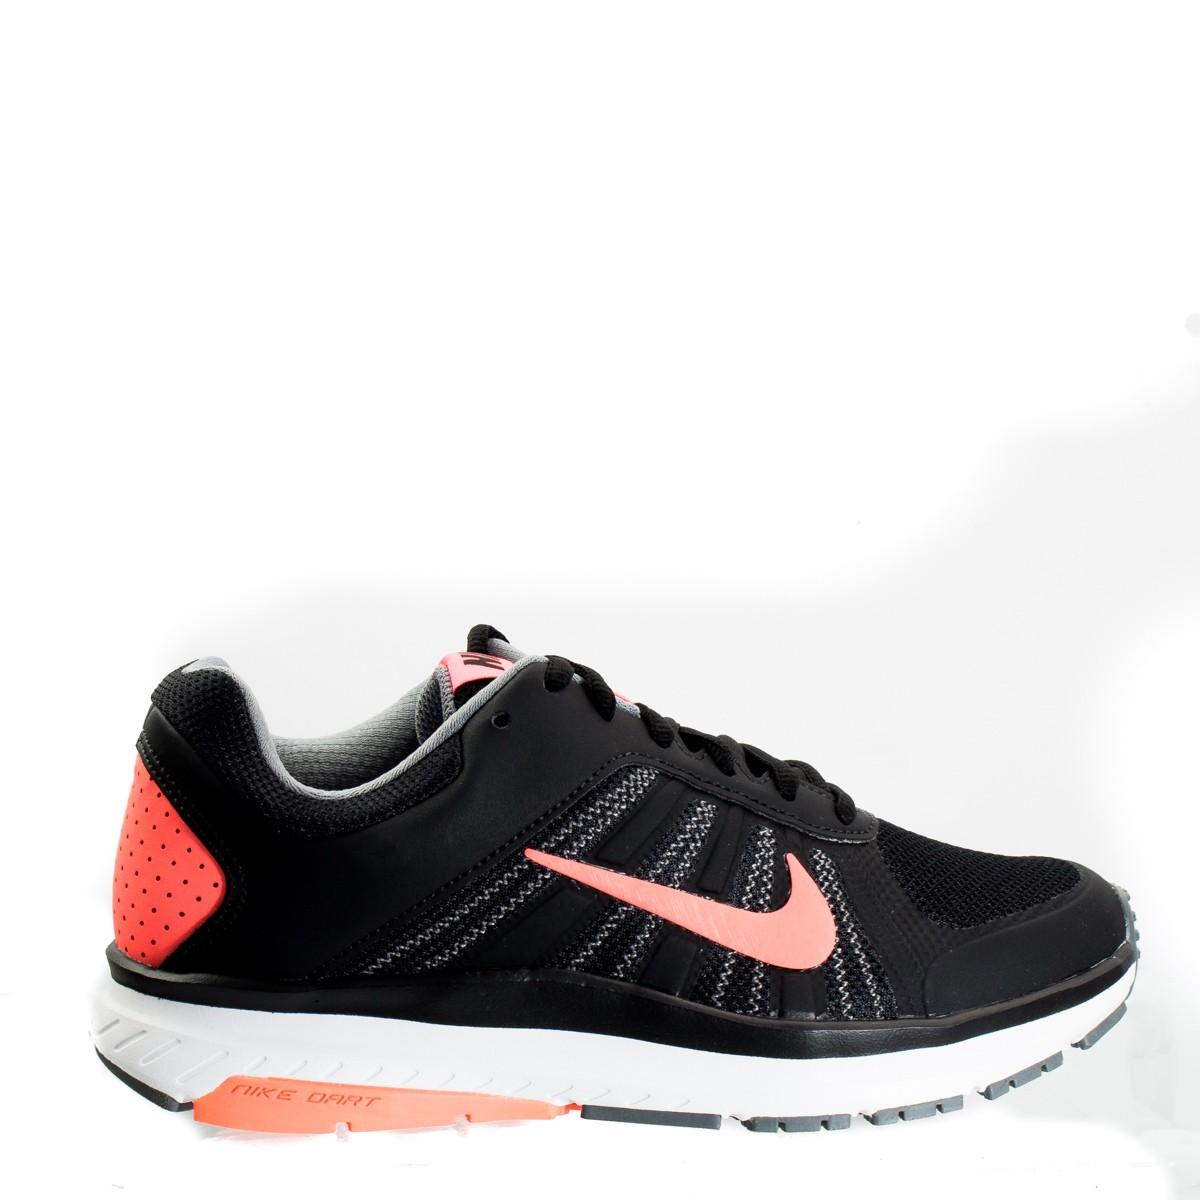 50e4857cef Bizz Store - Tênis Feminino Nike Dart 12 MSL Treino